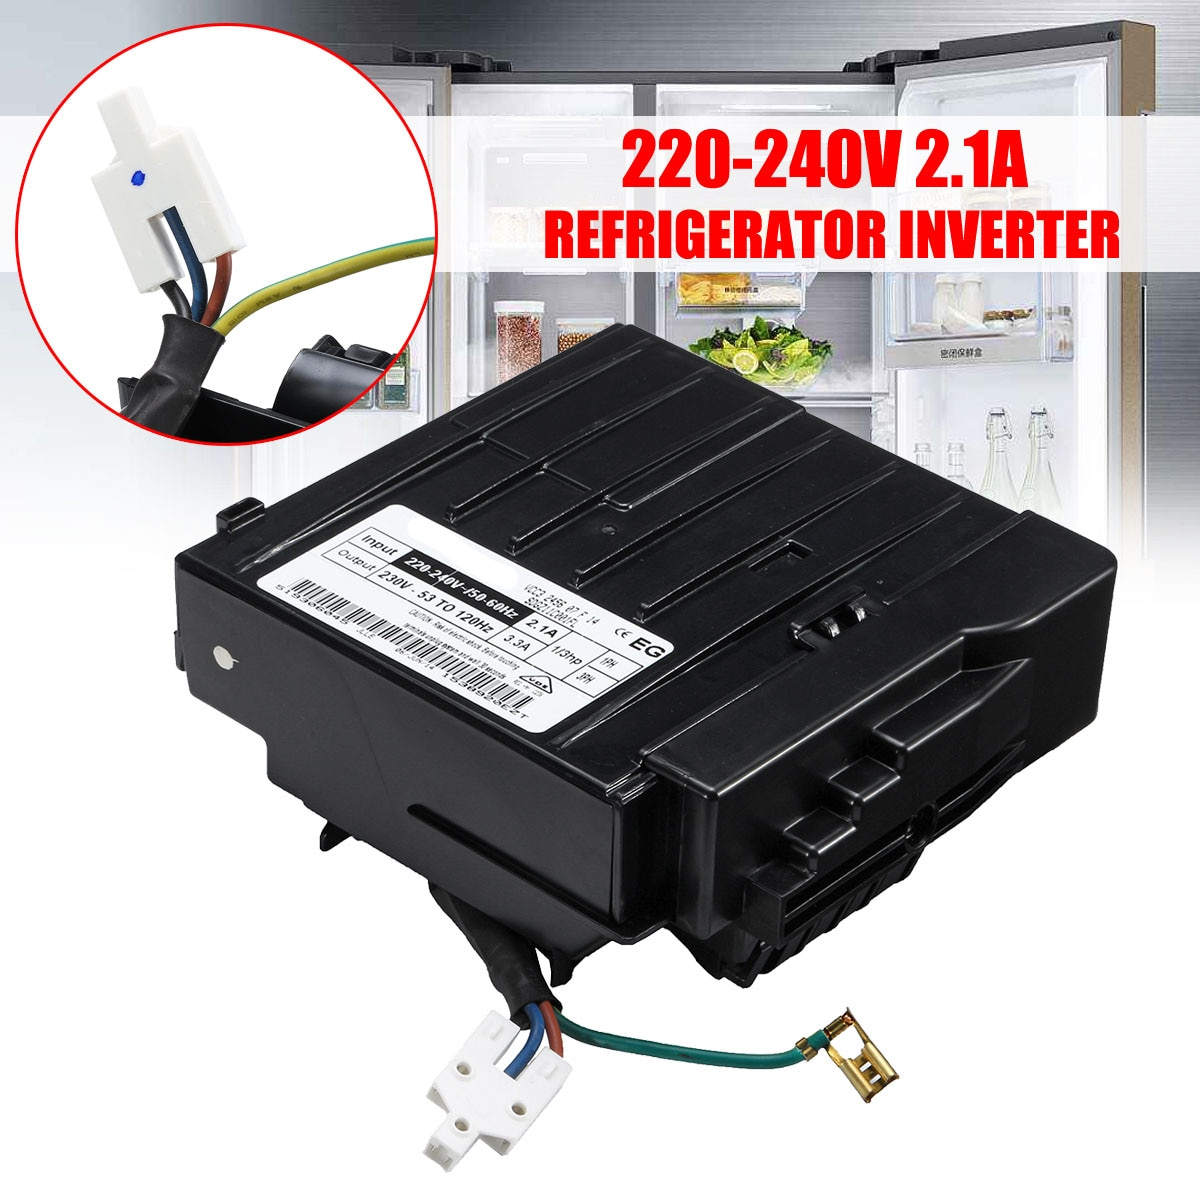 220-240V 2.1A 3PH VCC3 2456 07 Controle inverter Board Para Haier Inversor Geladeira para Geladeira Siemens Inversor